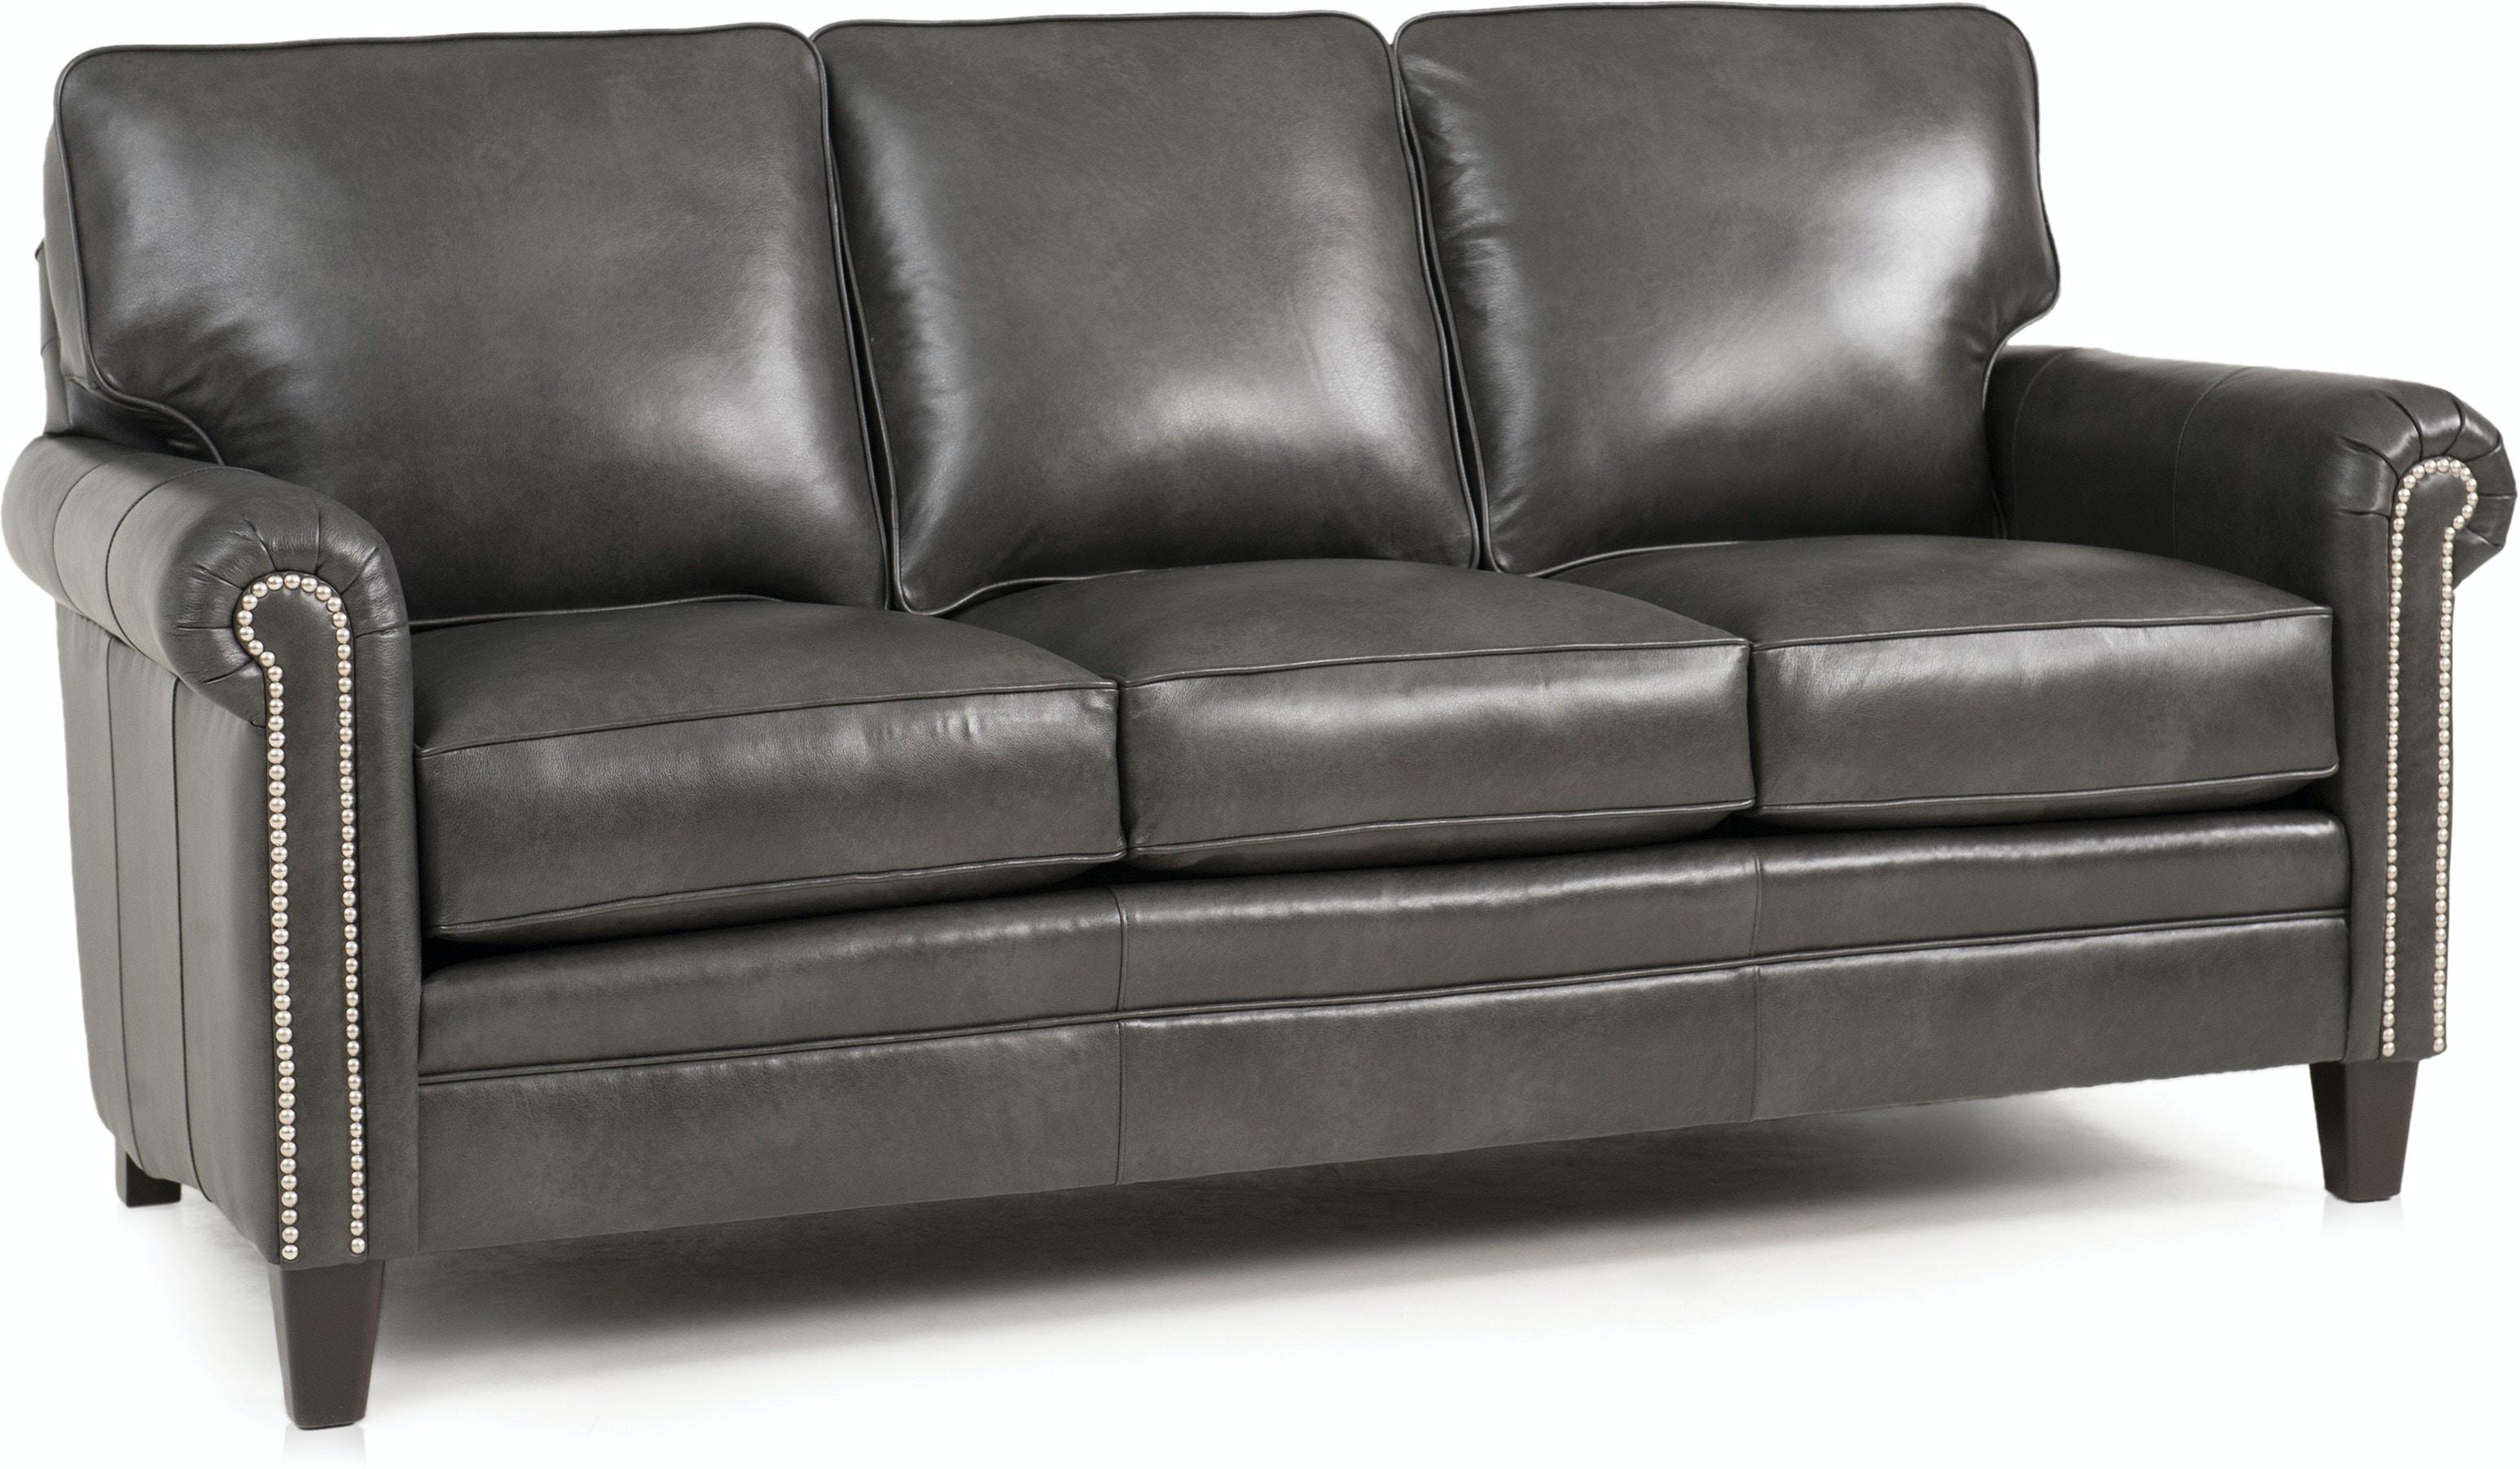 smith brothers living room midsize sofa 23411